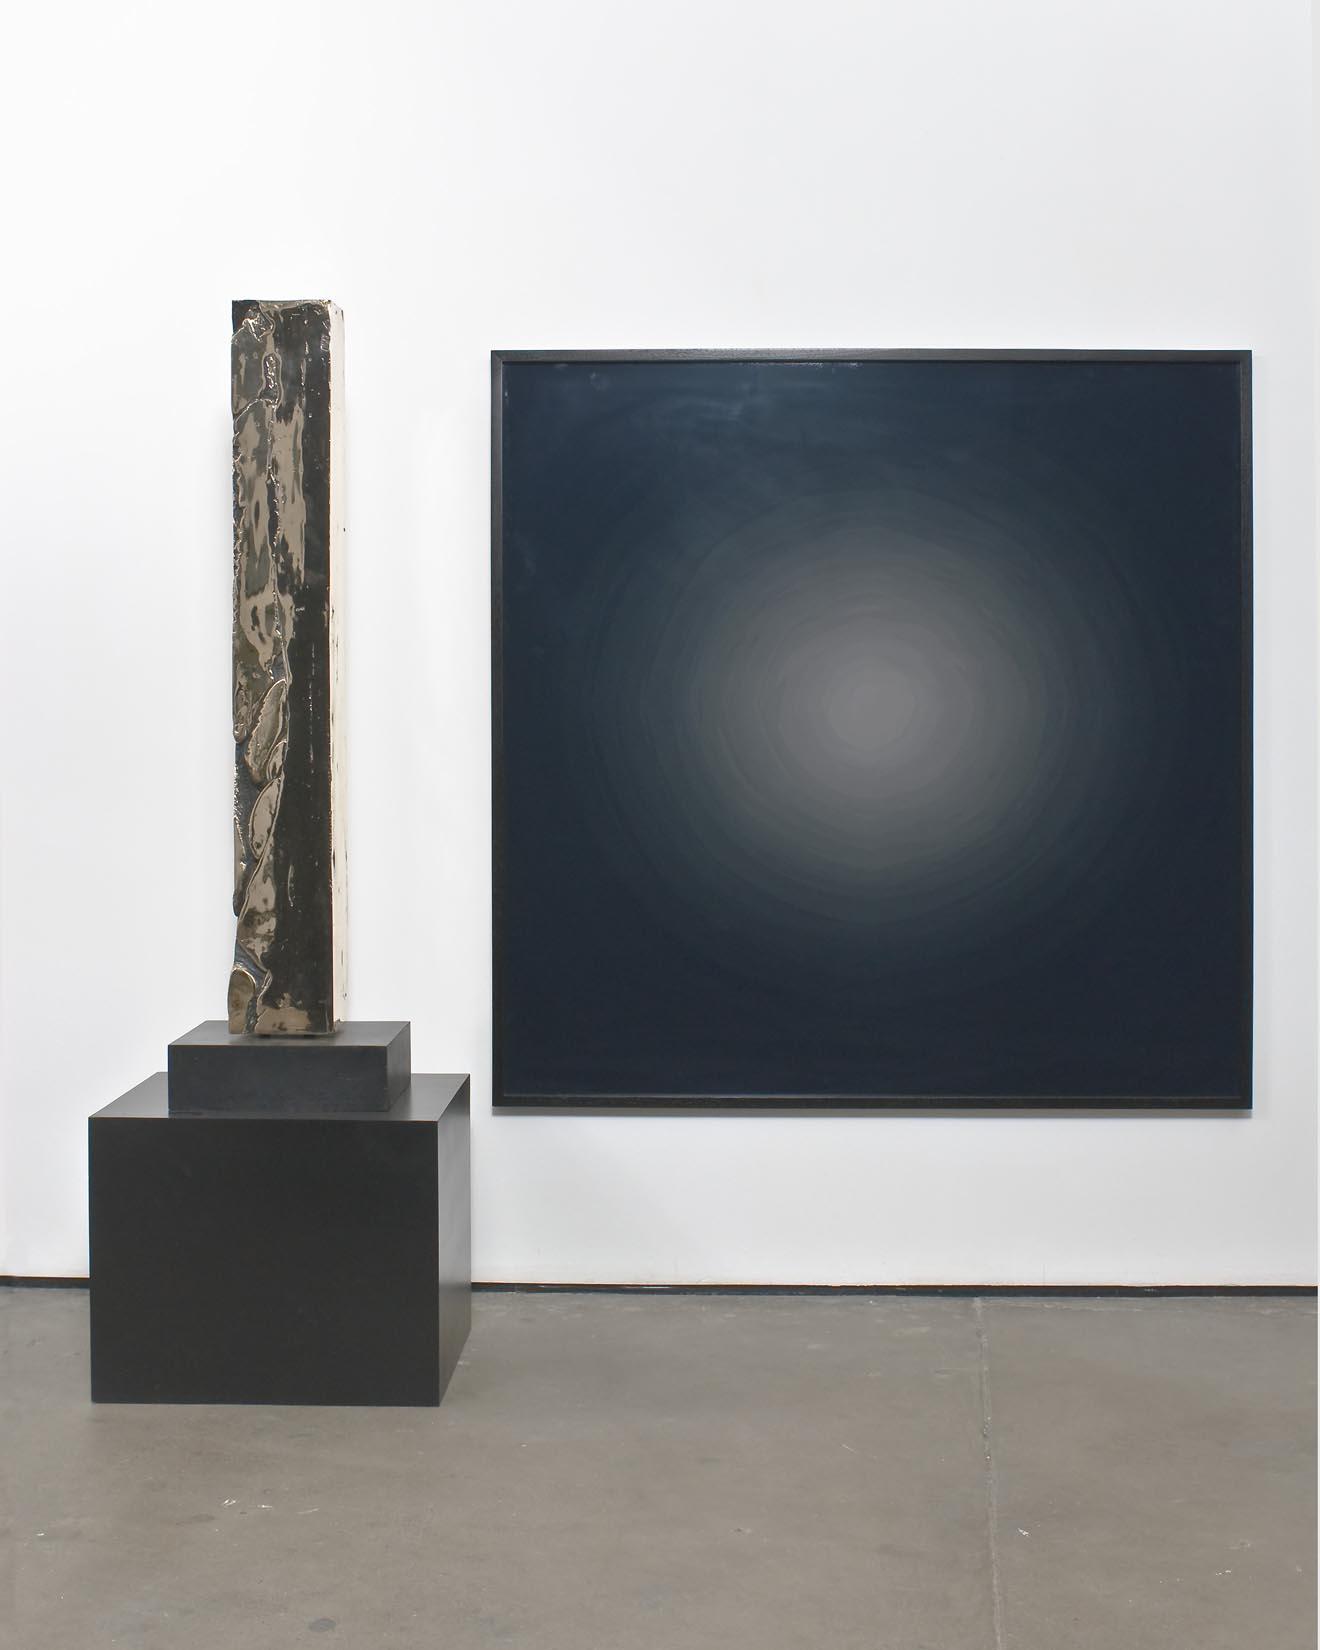 Anthony Pearson Untitled (Drop Cast Slab Arrangement) 2008 Uncoated hi-polished bronze sculpture, base, pedestal, framed c-print mounted to acrylic in artist's frame: 144.8 x 162.6 x 50.8 cm